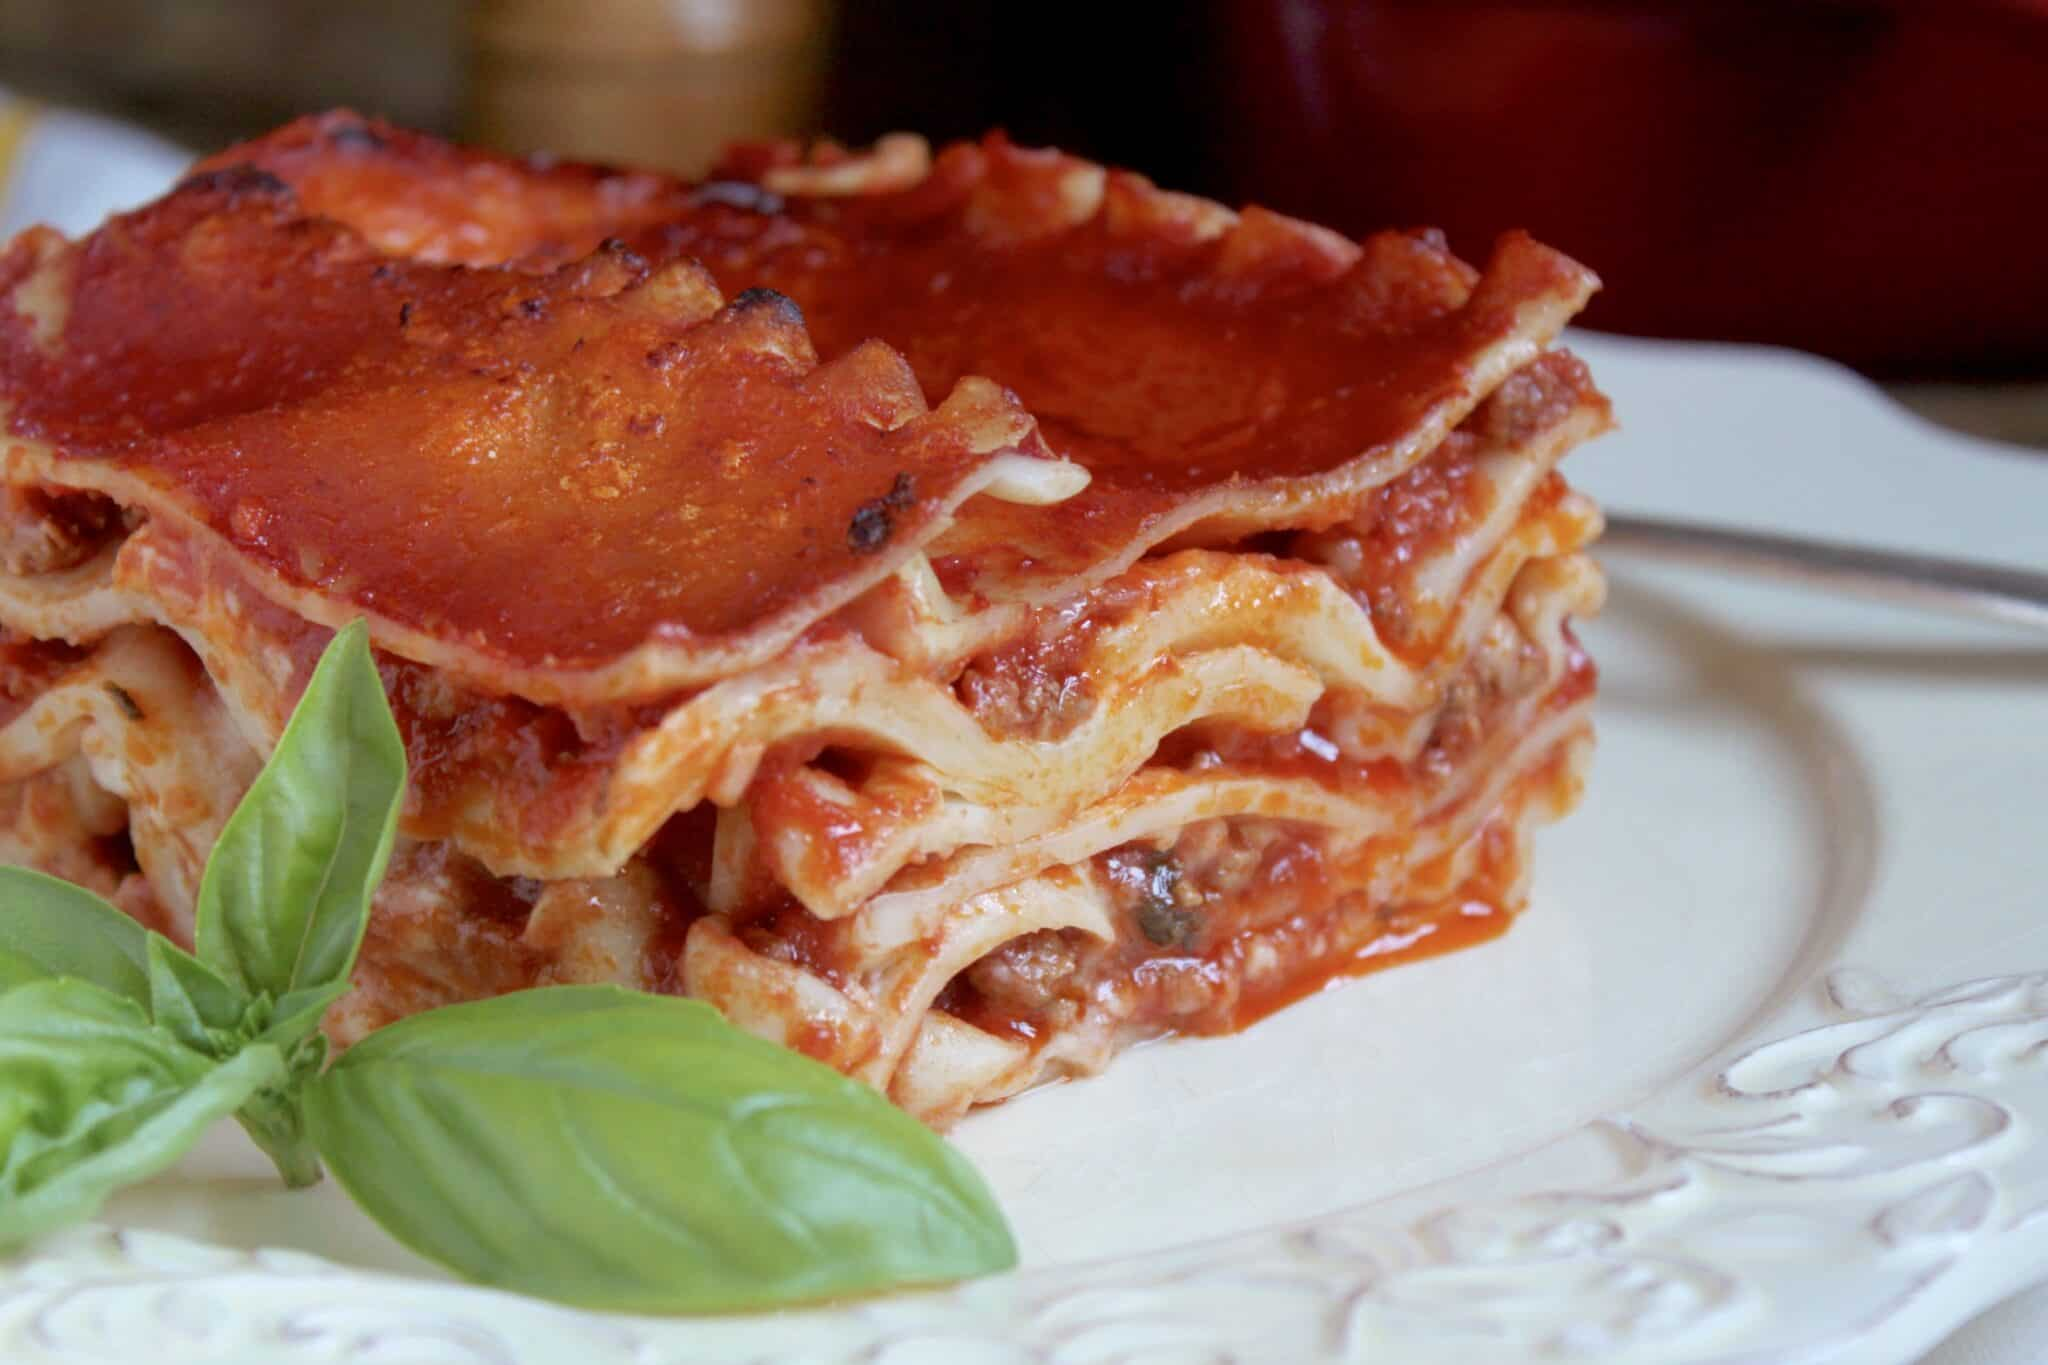 lasagna on a plate with a basil leaf